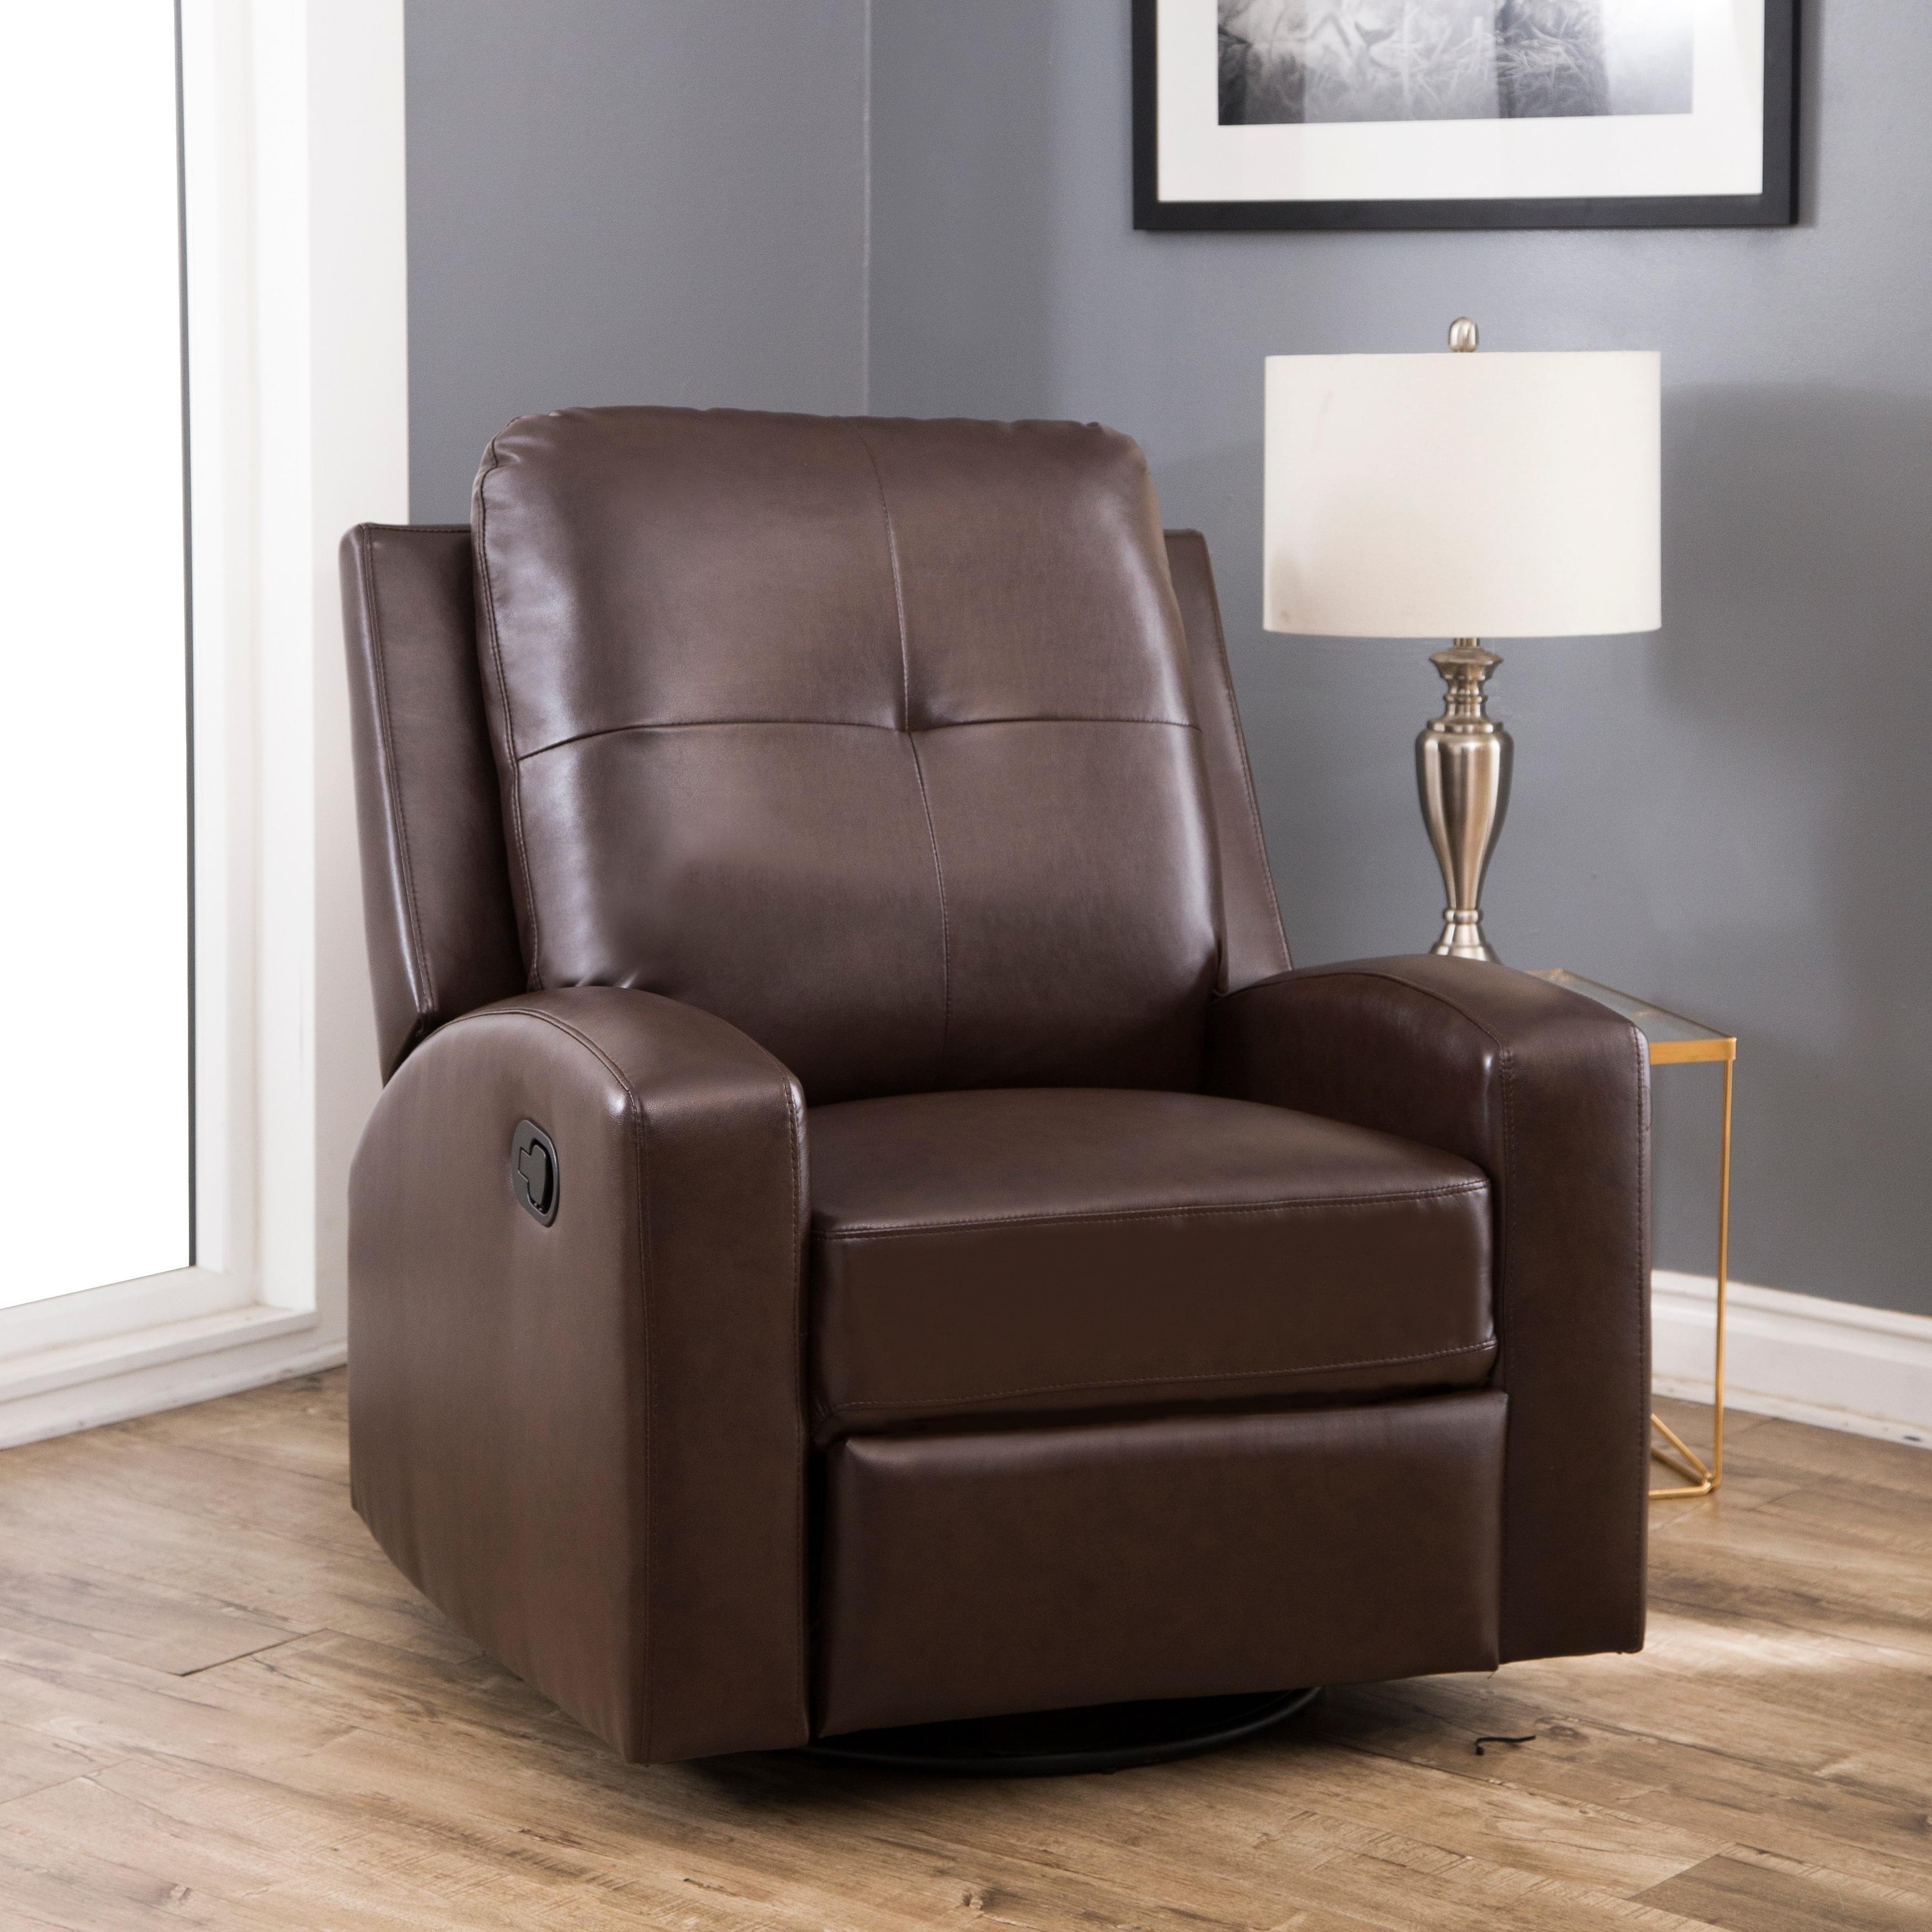 Buy Oliver u0026 James Recliner Chairs u0026